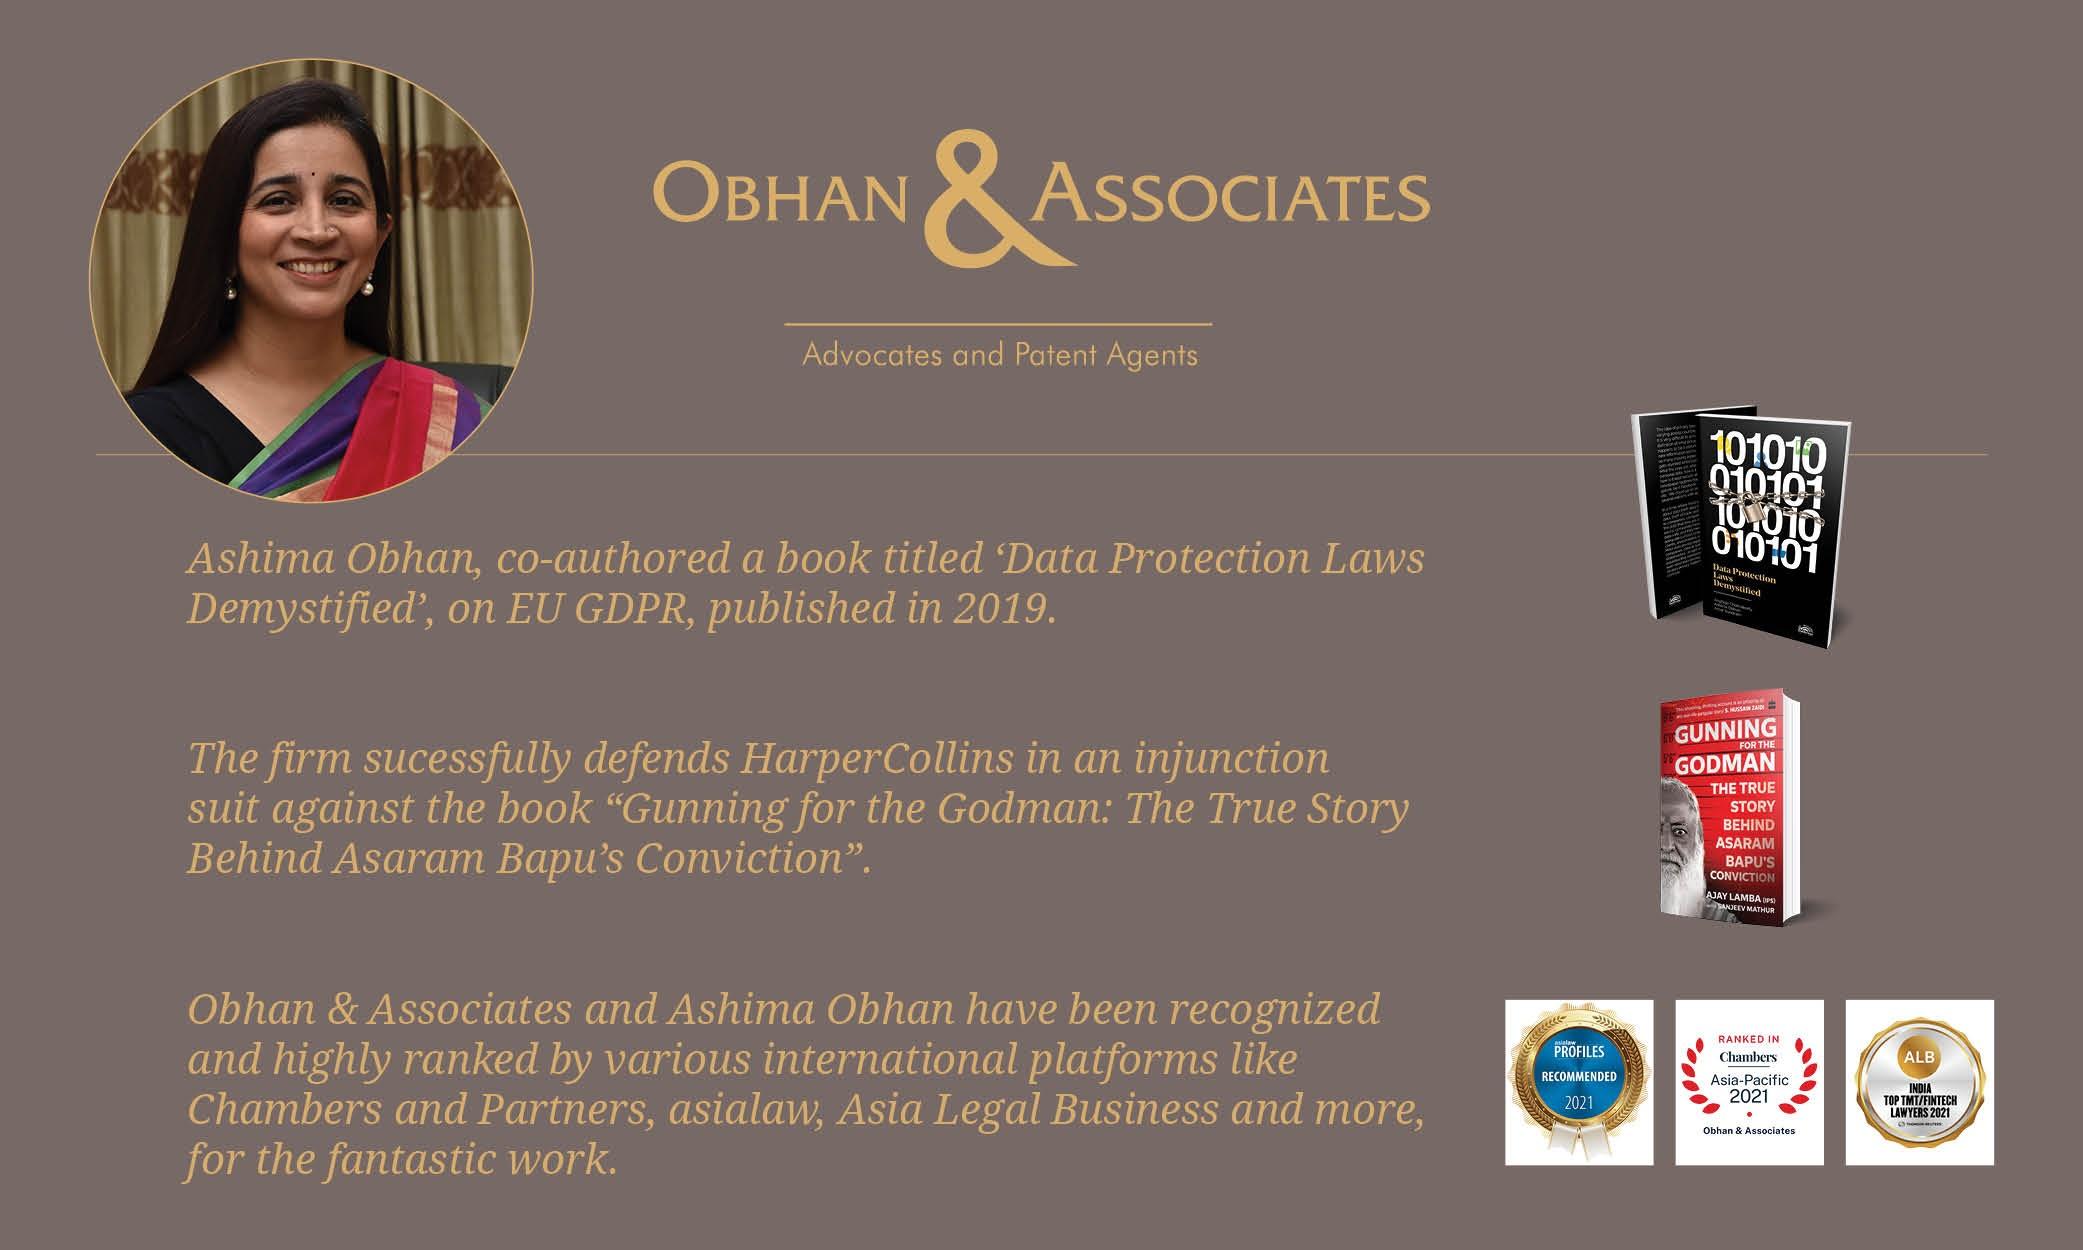 In Conversation With Ashima Obhan, Senior Partner, Obhan & Associates